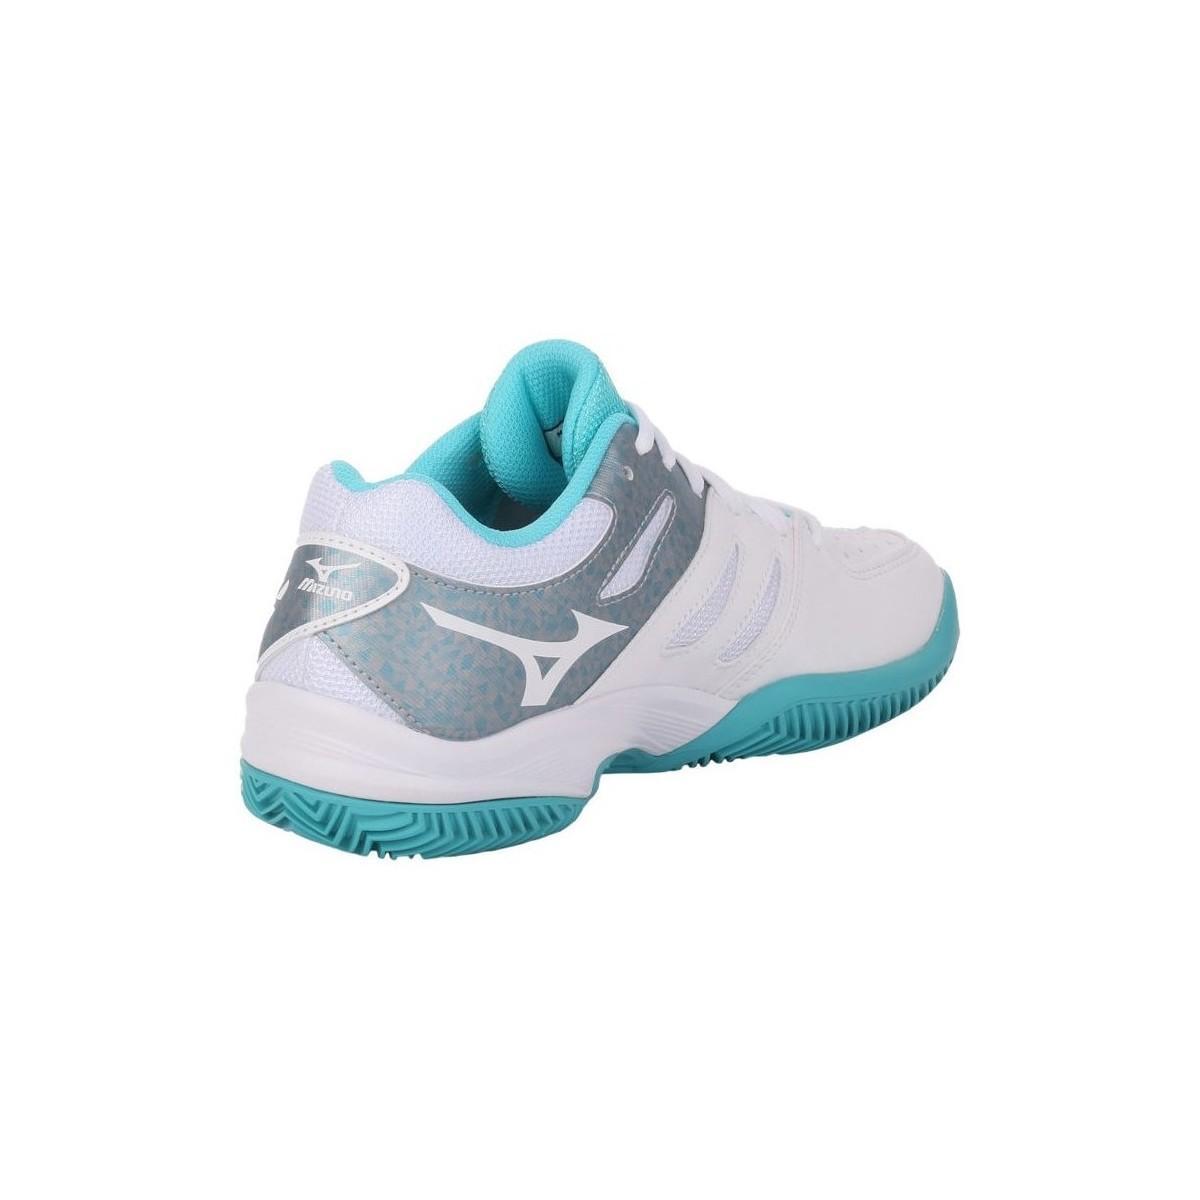 fde8a0eb1c0f Mizuno - Break Shot 2 Cc Women's Shoes (trainers) In White - Lyst. View  fullscreen